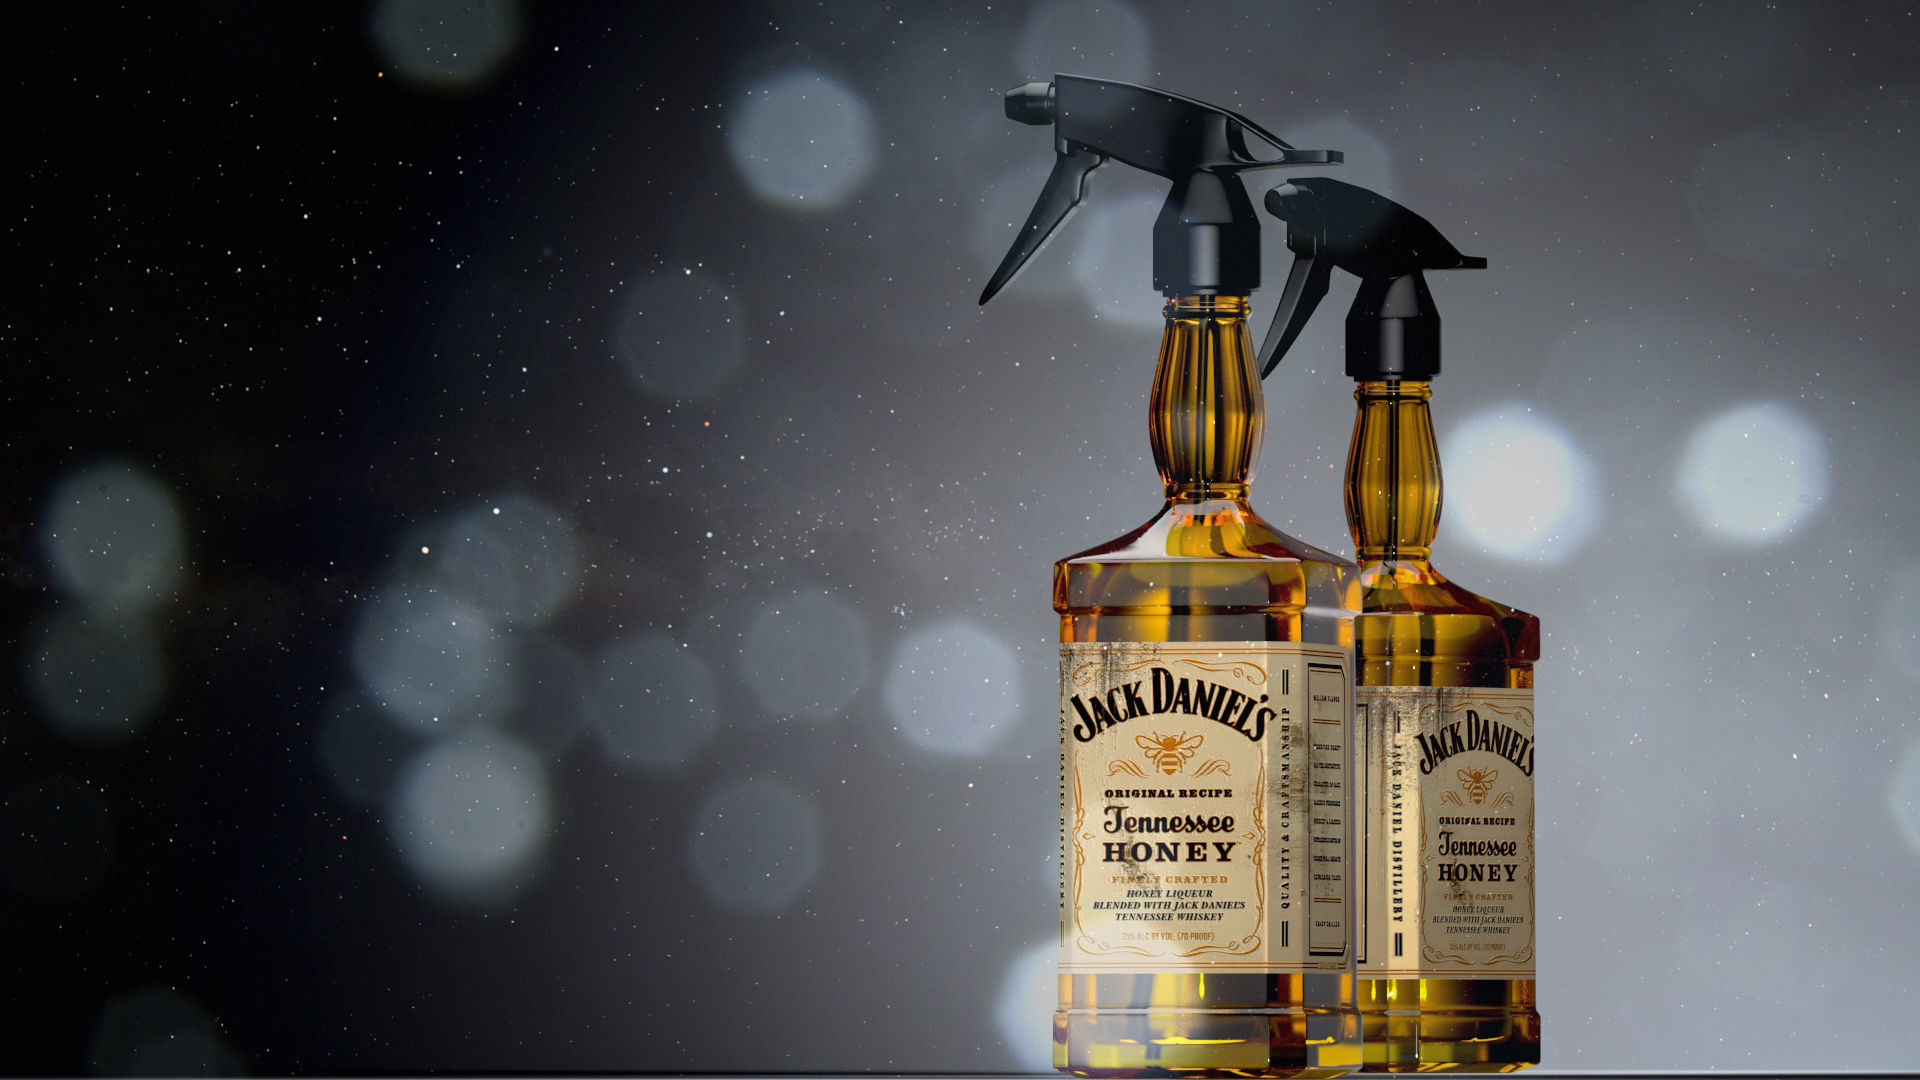 Jack Daniels water Sprayer